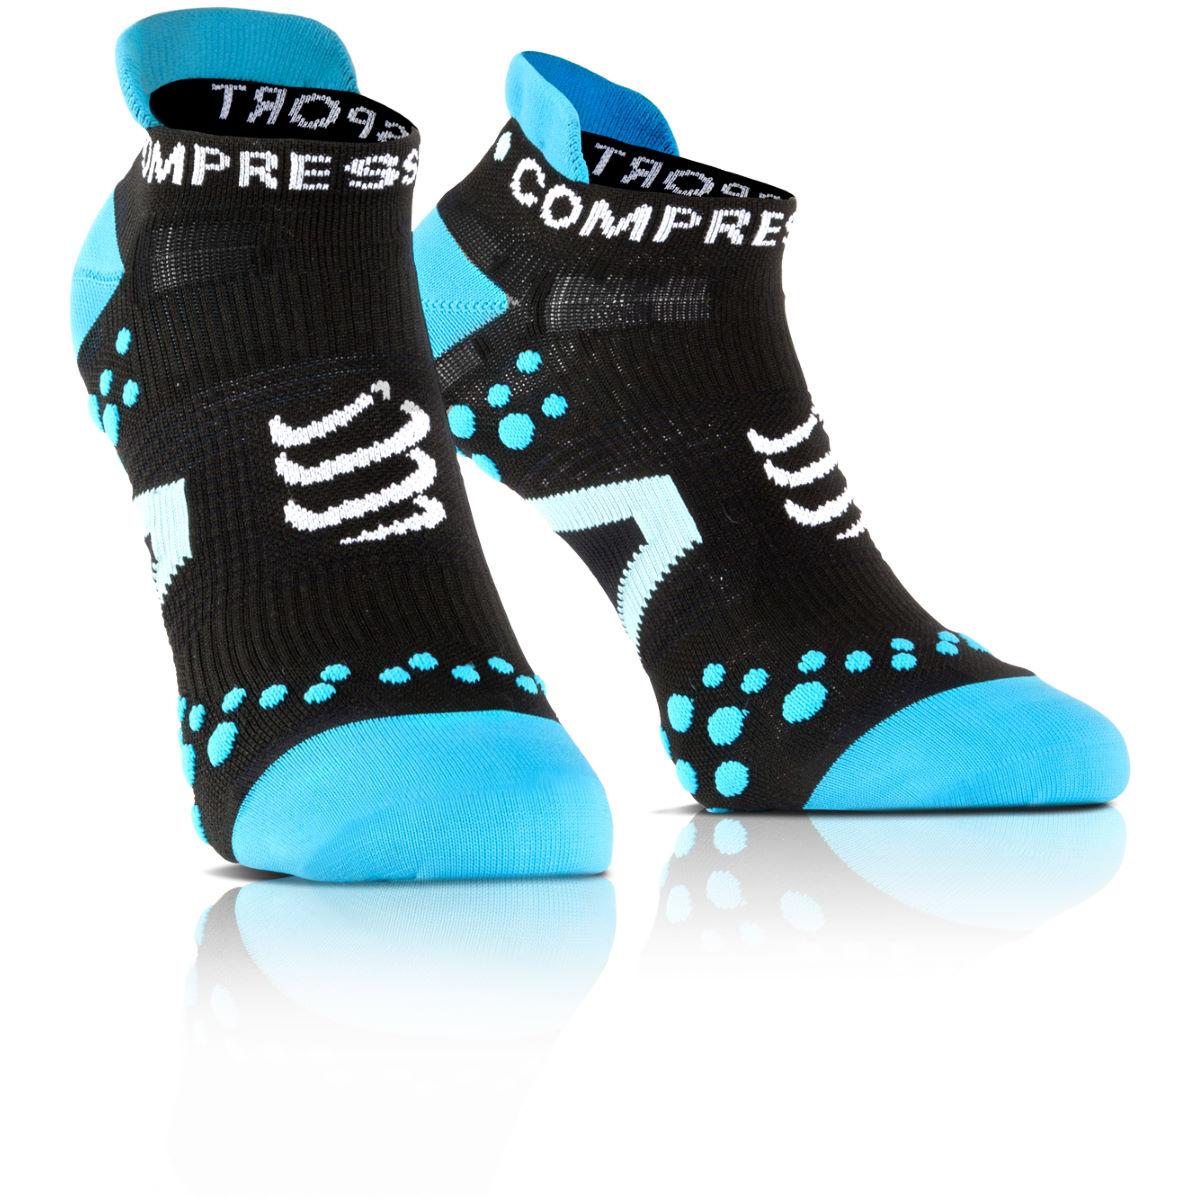 Calcetines tobilleros Compressport Pro Racing v2.1  - Calcetines para correr